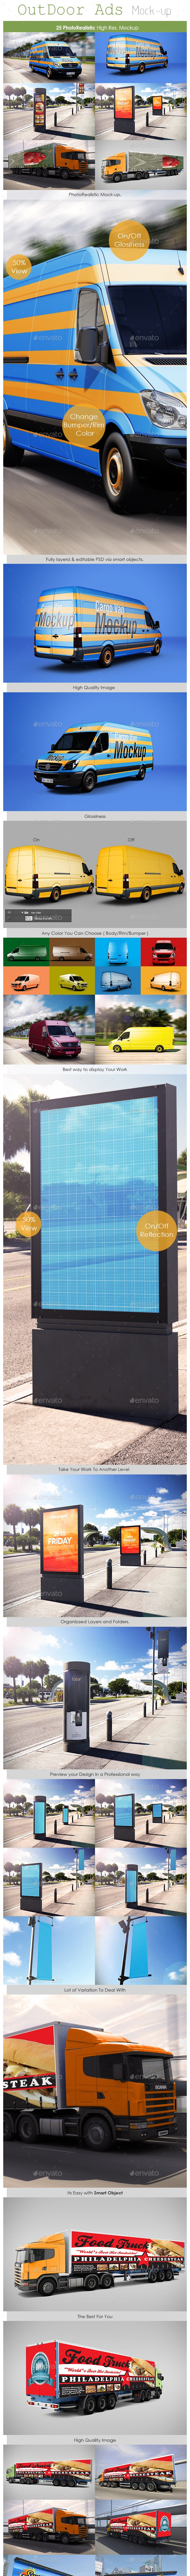 Outdoor Ads Mockup - Print Product Mock-Ups